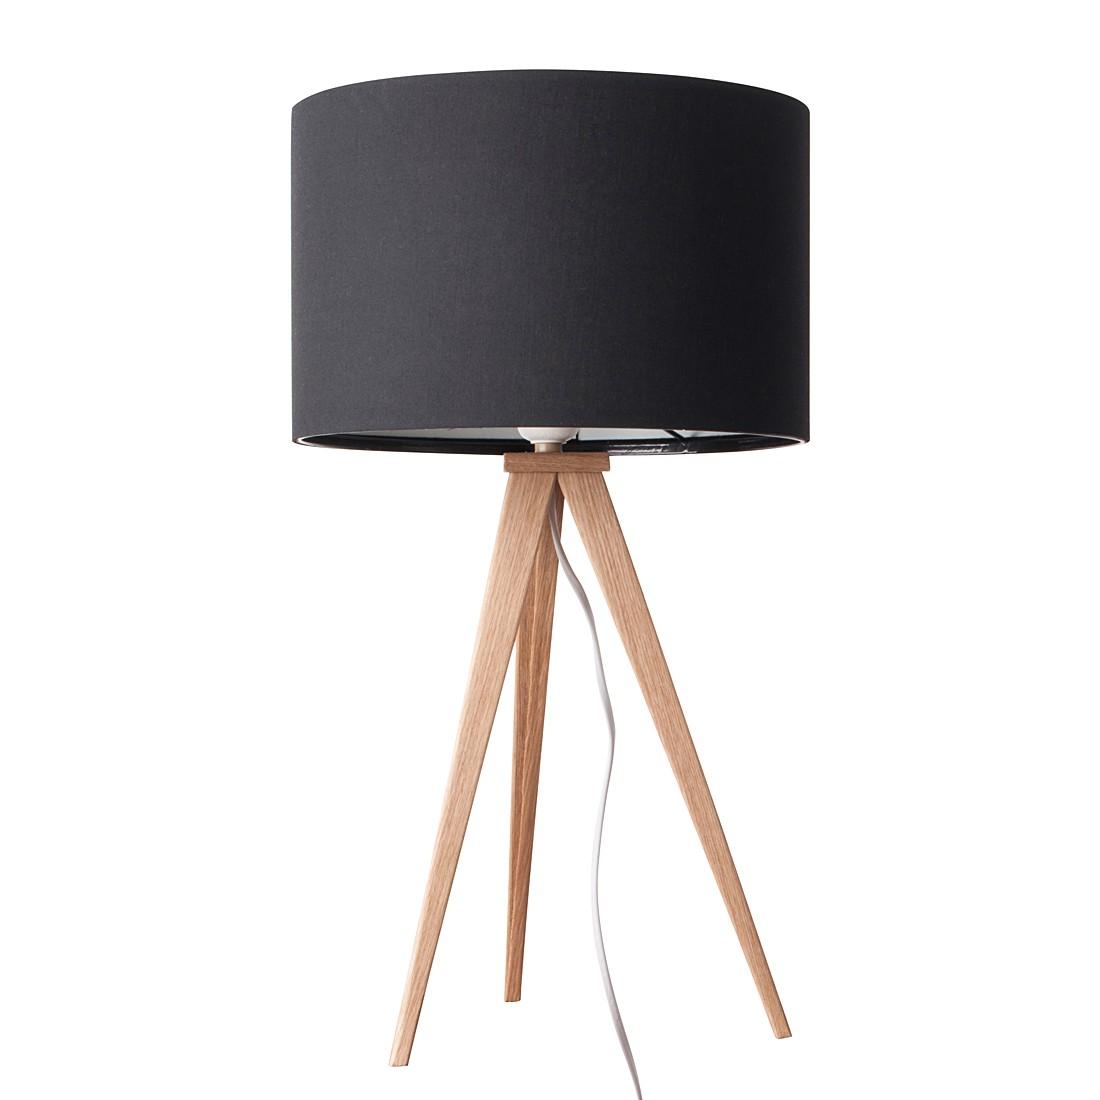 EEK A++, Lampe de table TRIPOD WOOD - Métal / Fer 1 ampoule, Zuiver